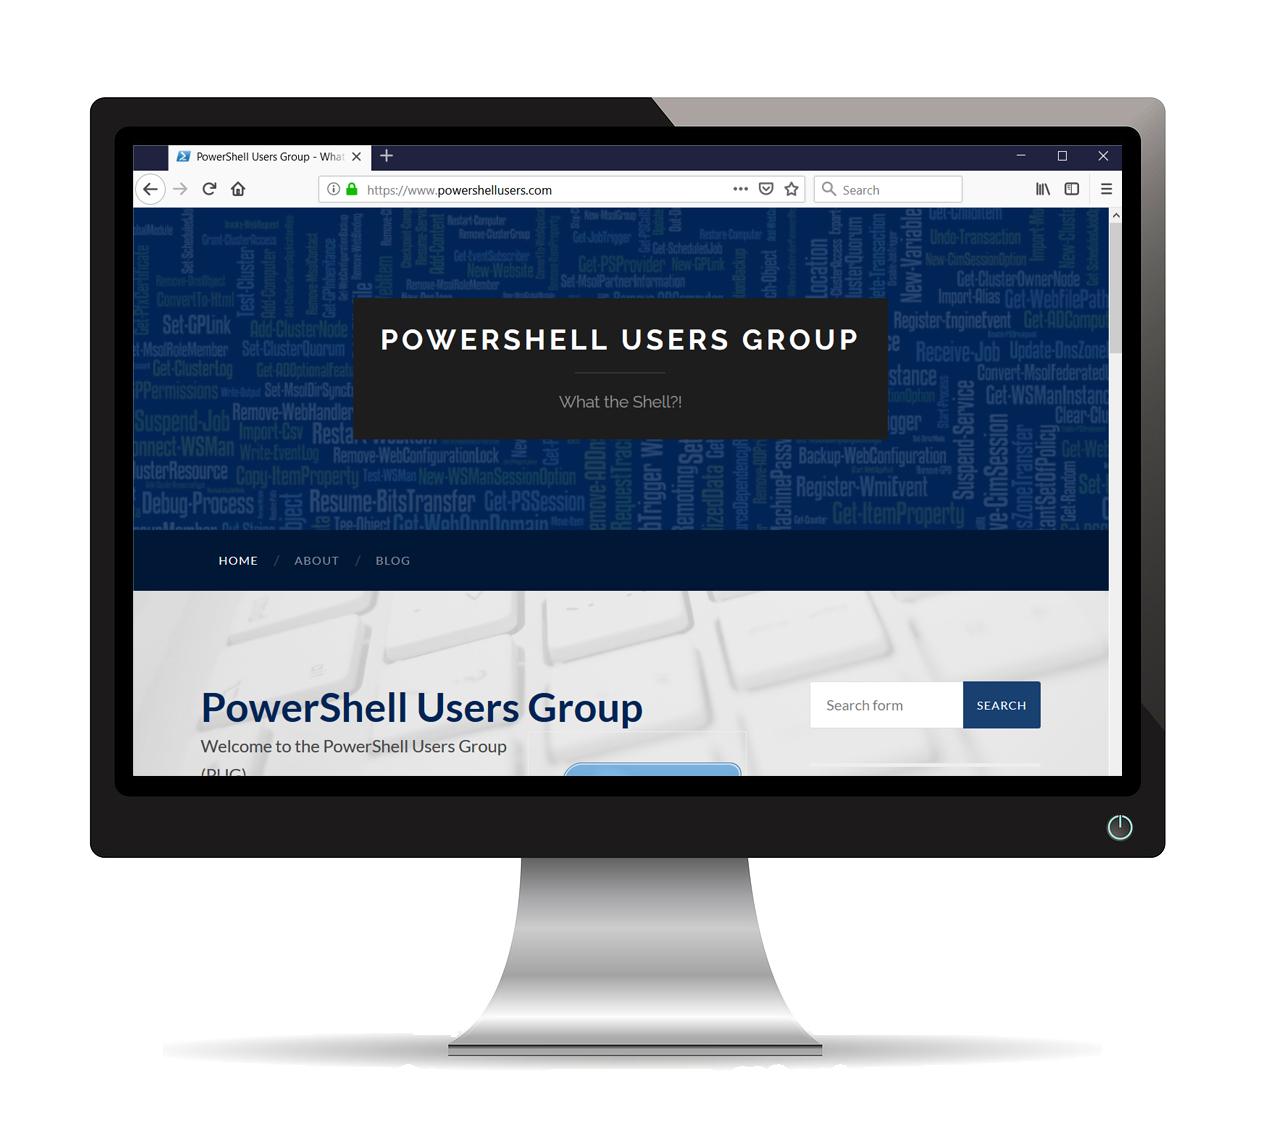 Appleton PowerShell Uesrs Group Website